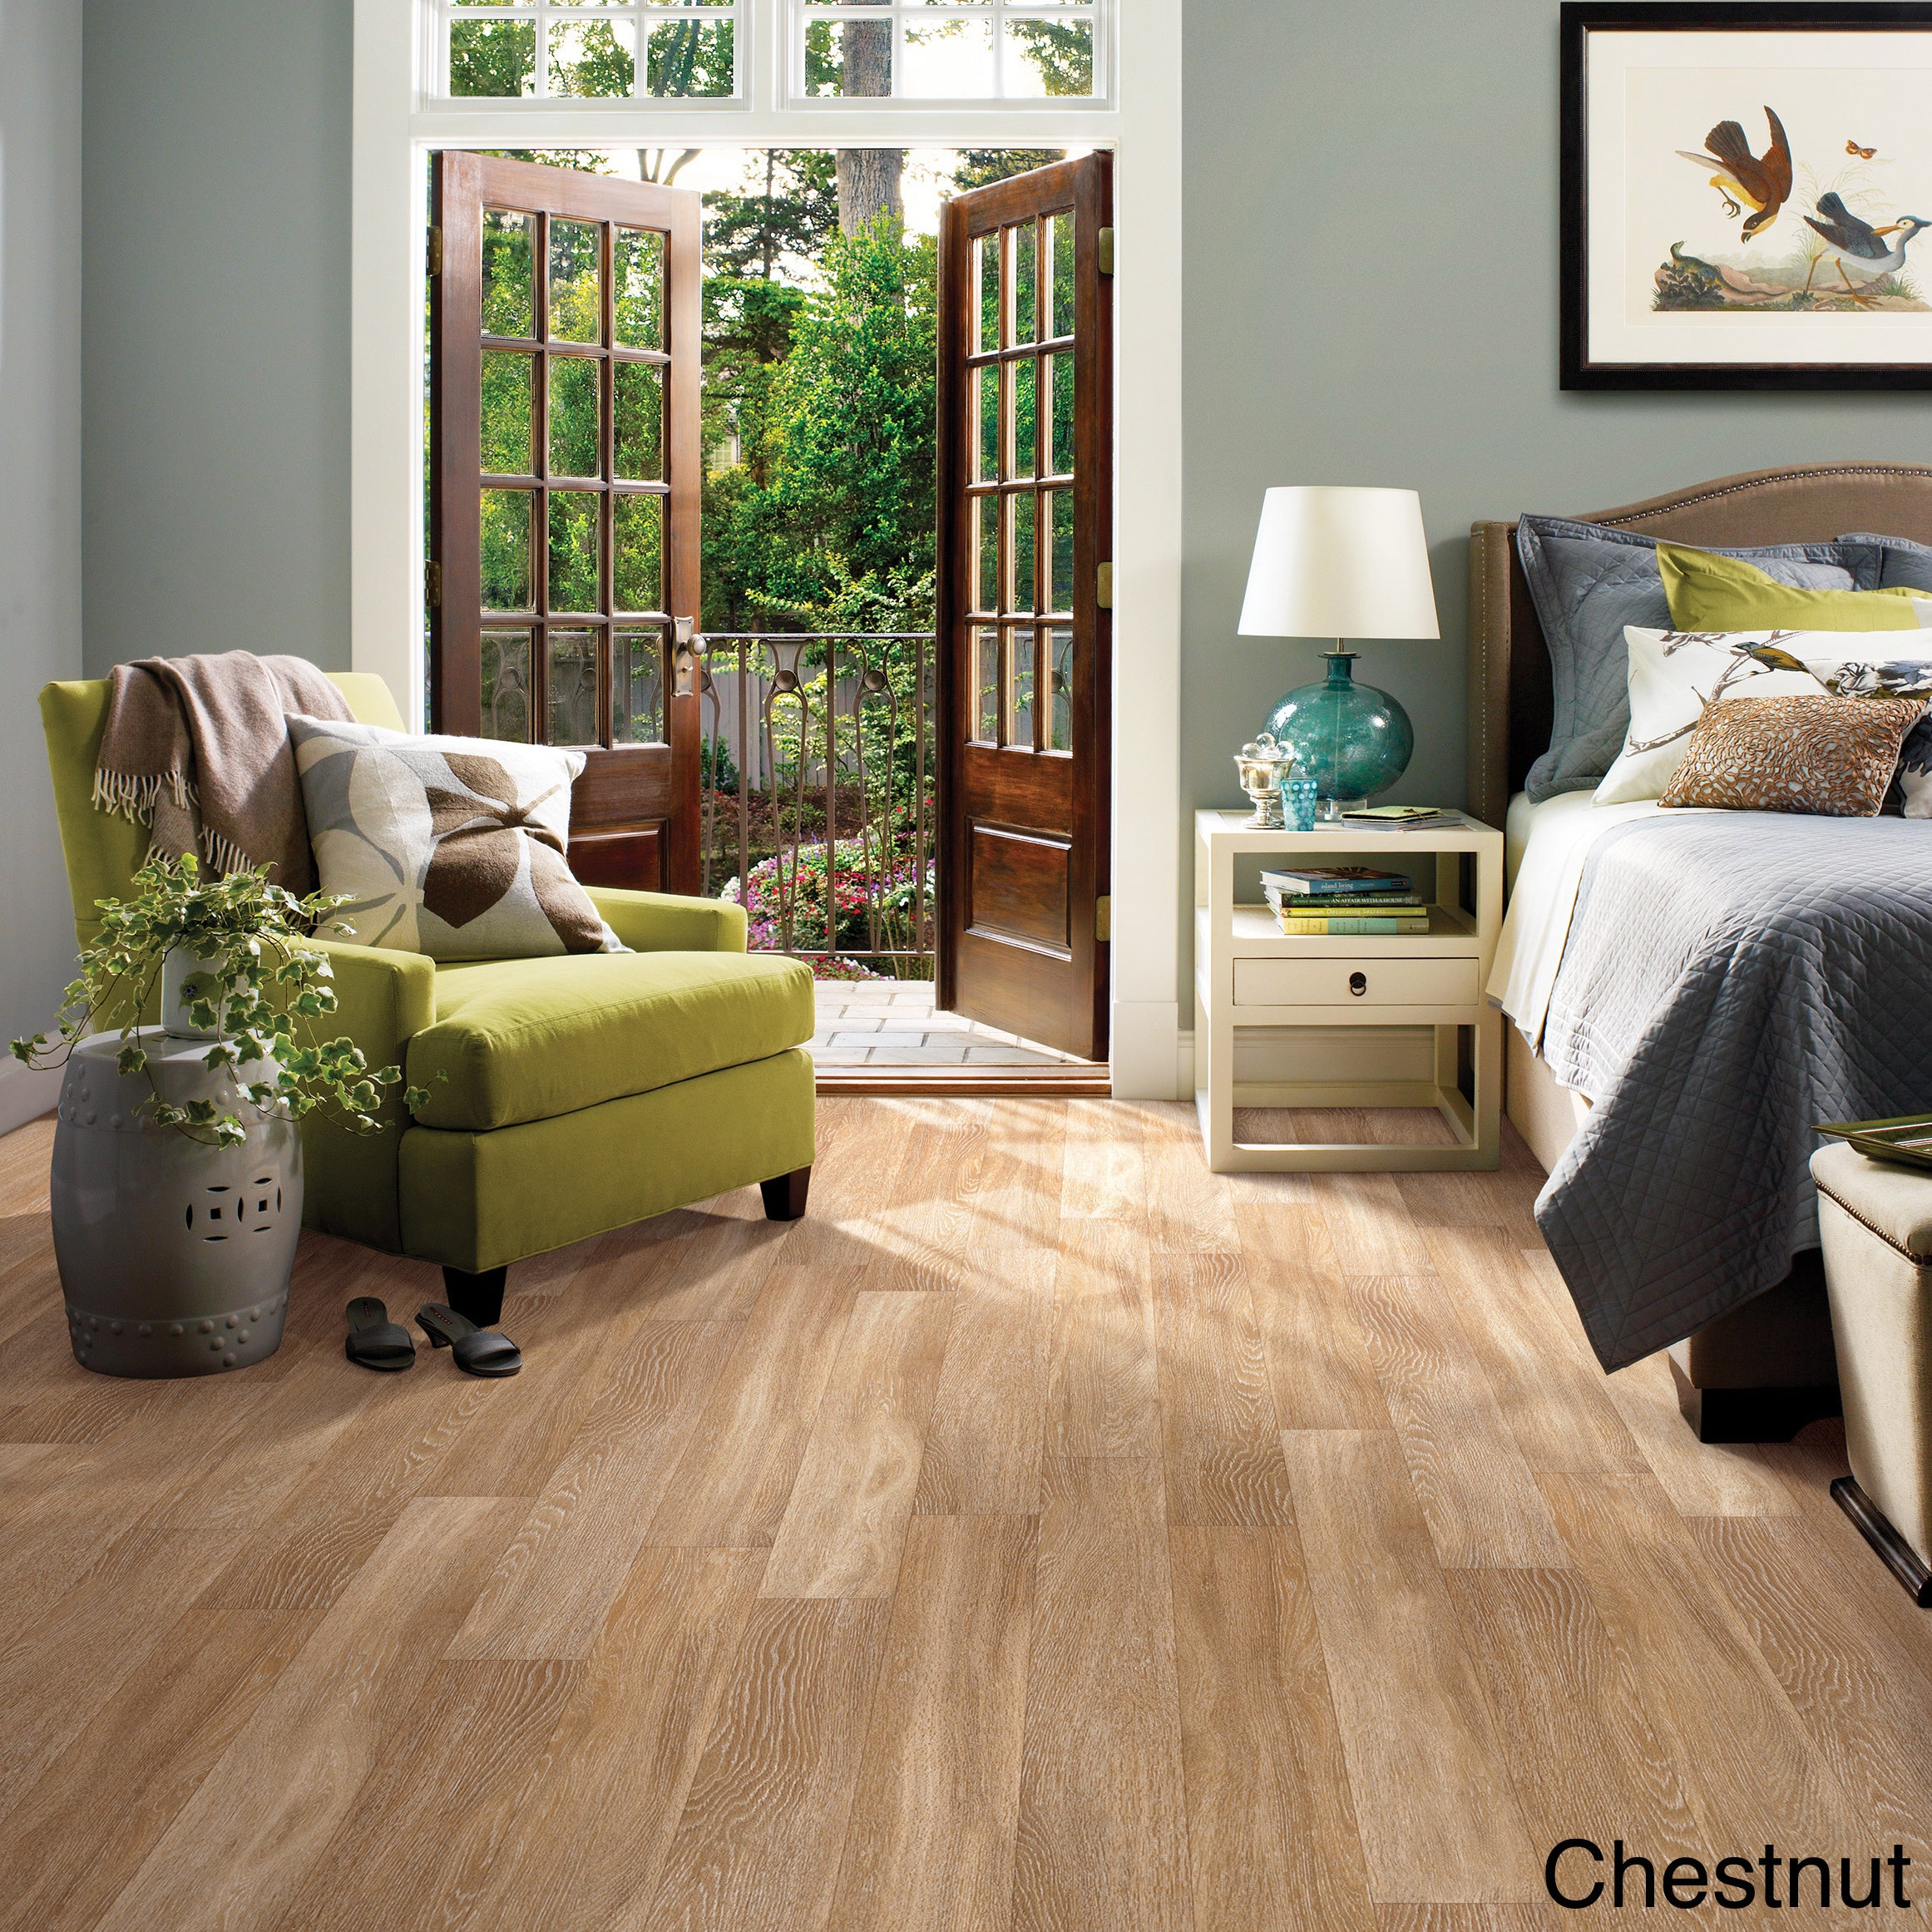 flooring shaw wpc floors galore views vinyl file plank installation products more genoa plus